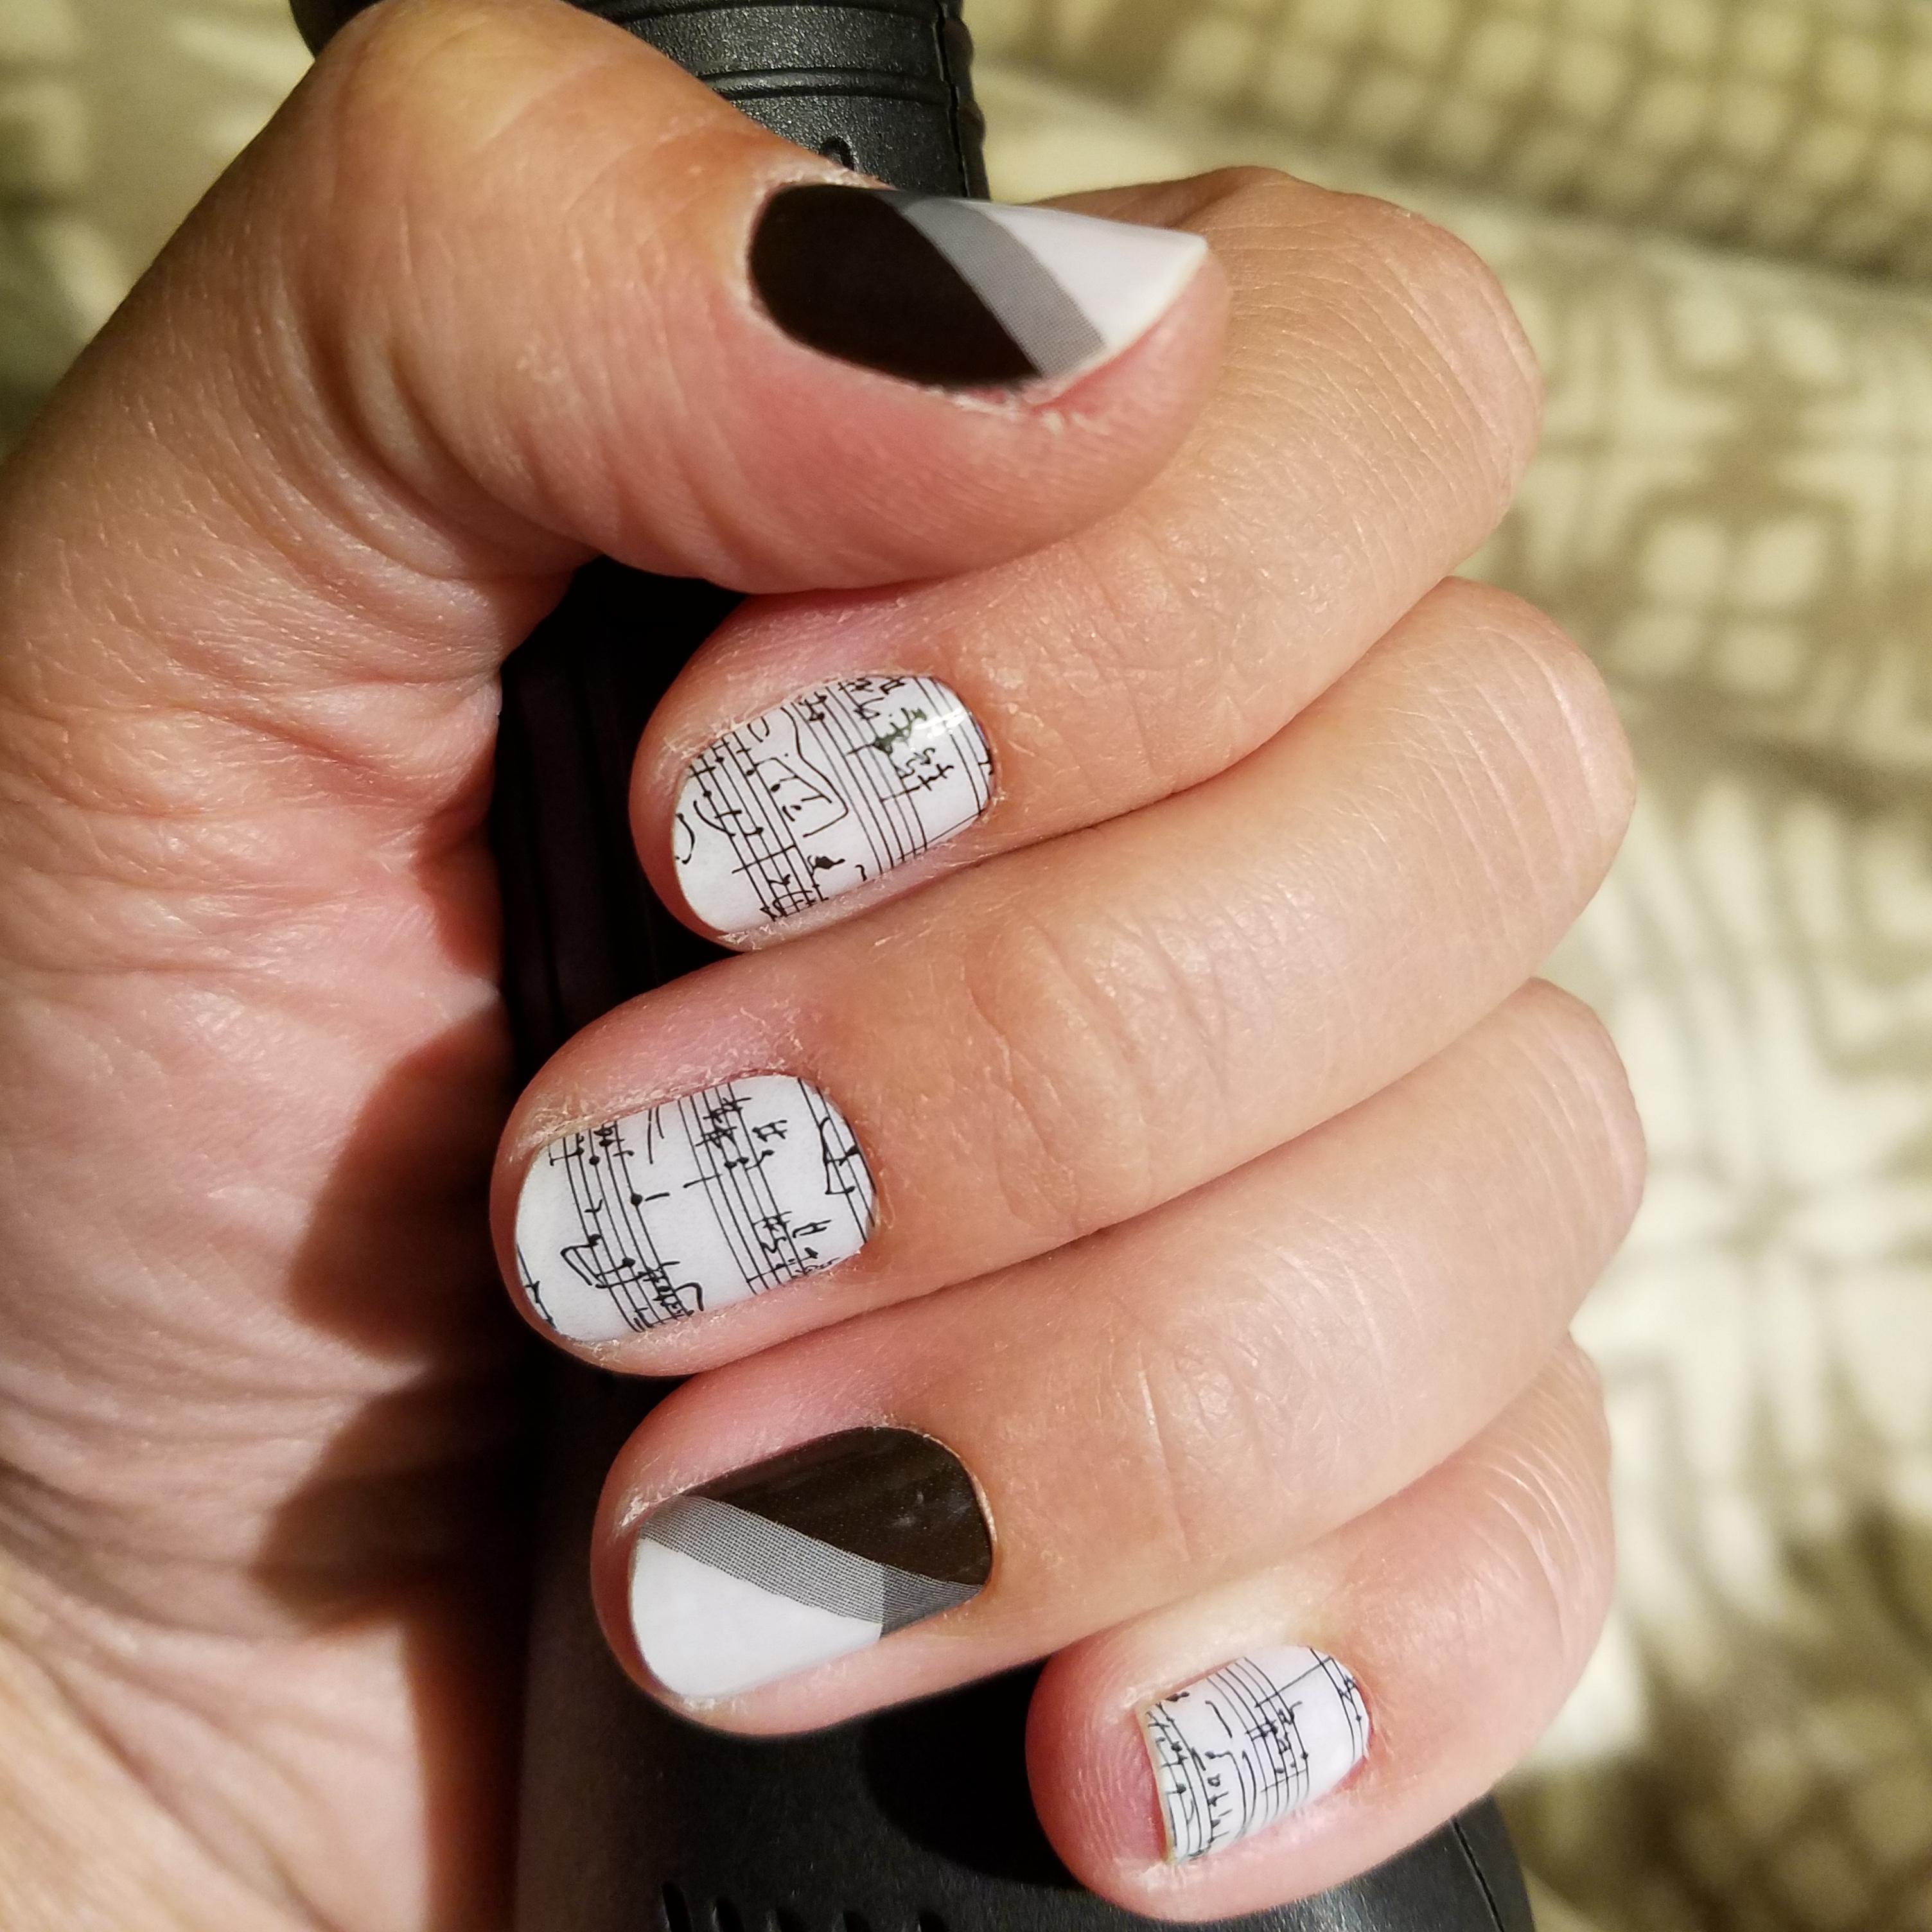 BrSO Manicure Night